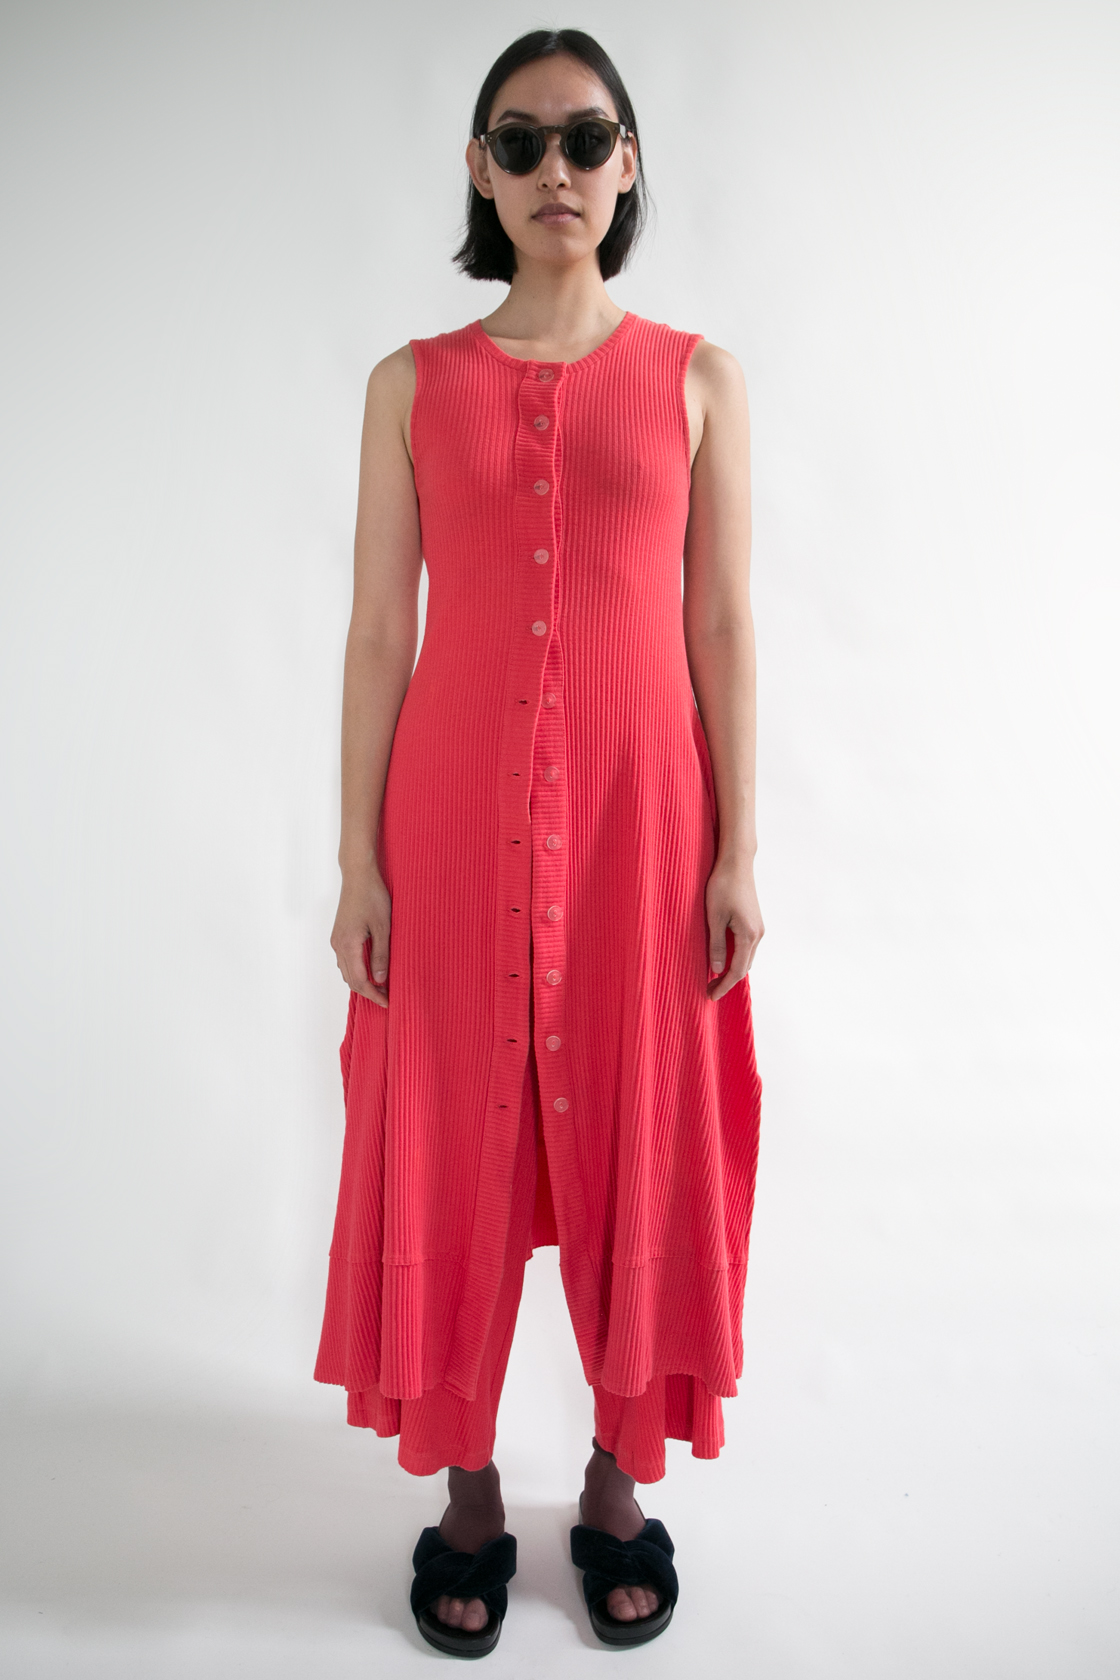 Basic Color Sleeveless Dress III  XS S M L  $288